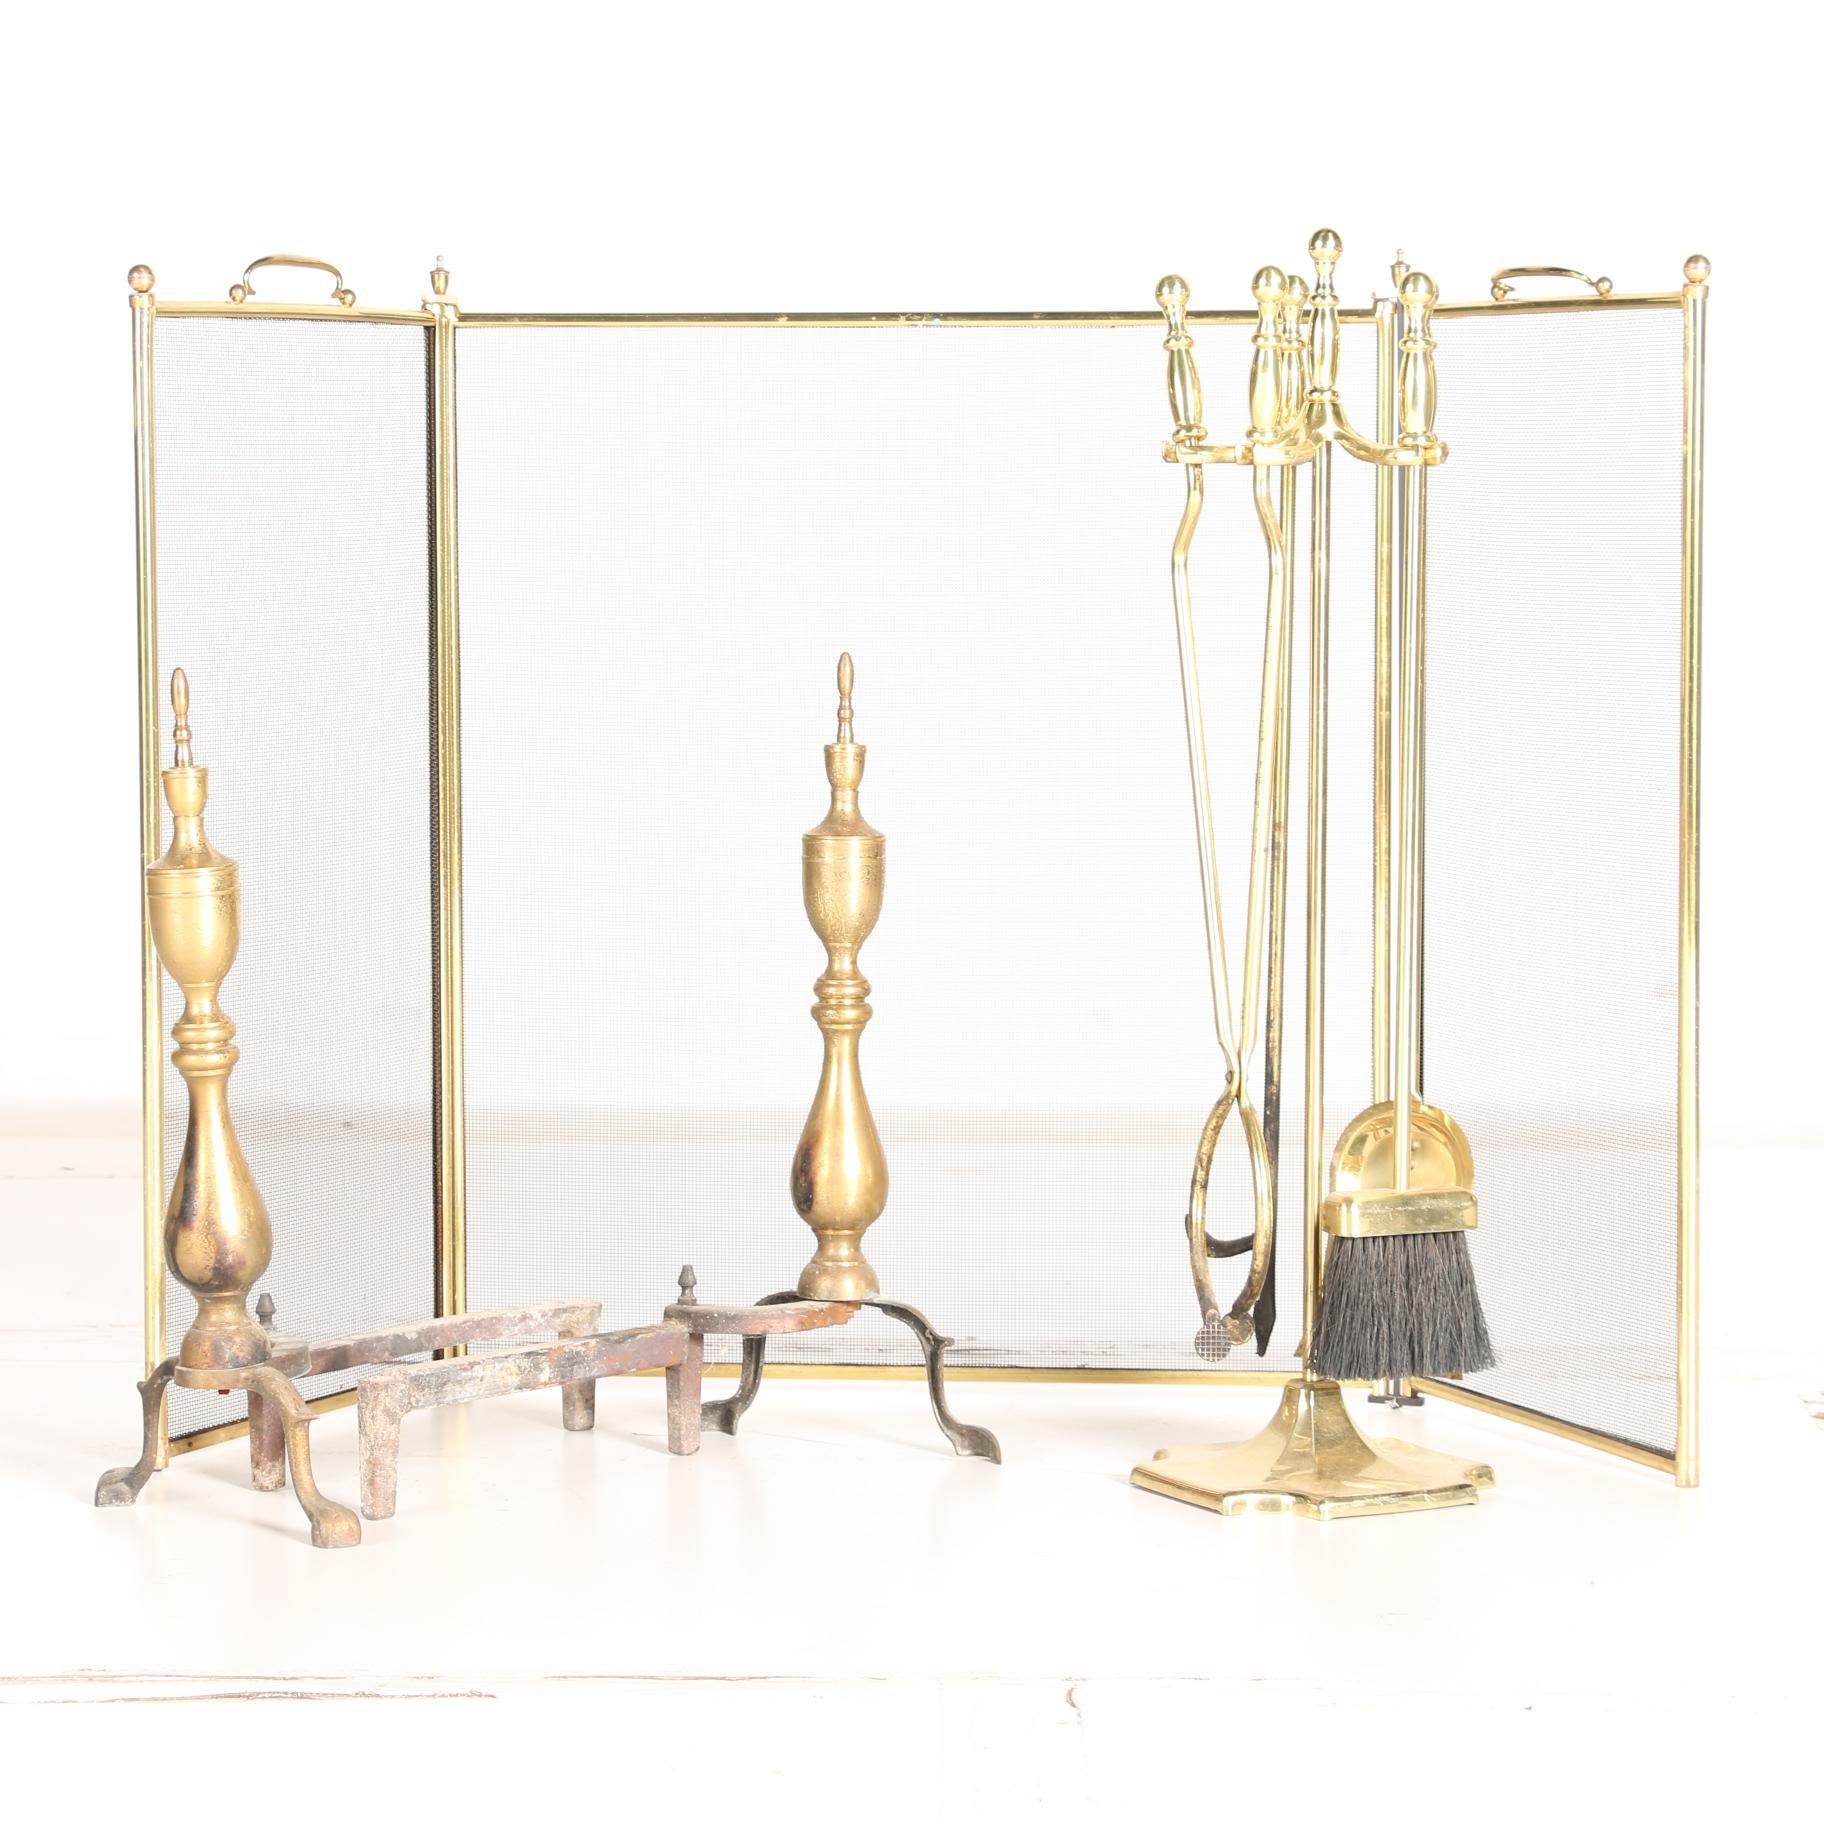 Vintage Brass Fireplace Tools